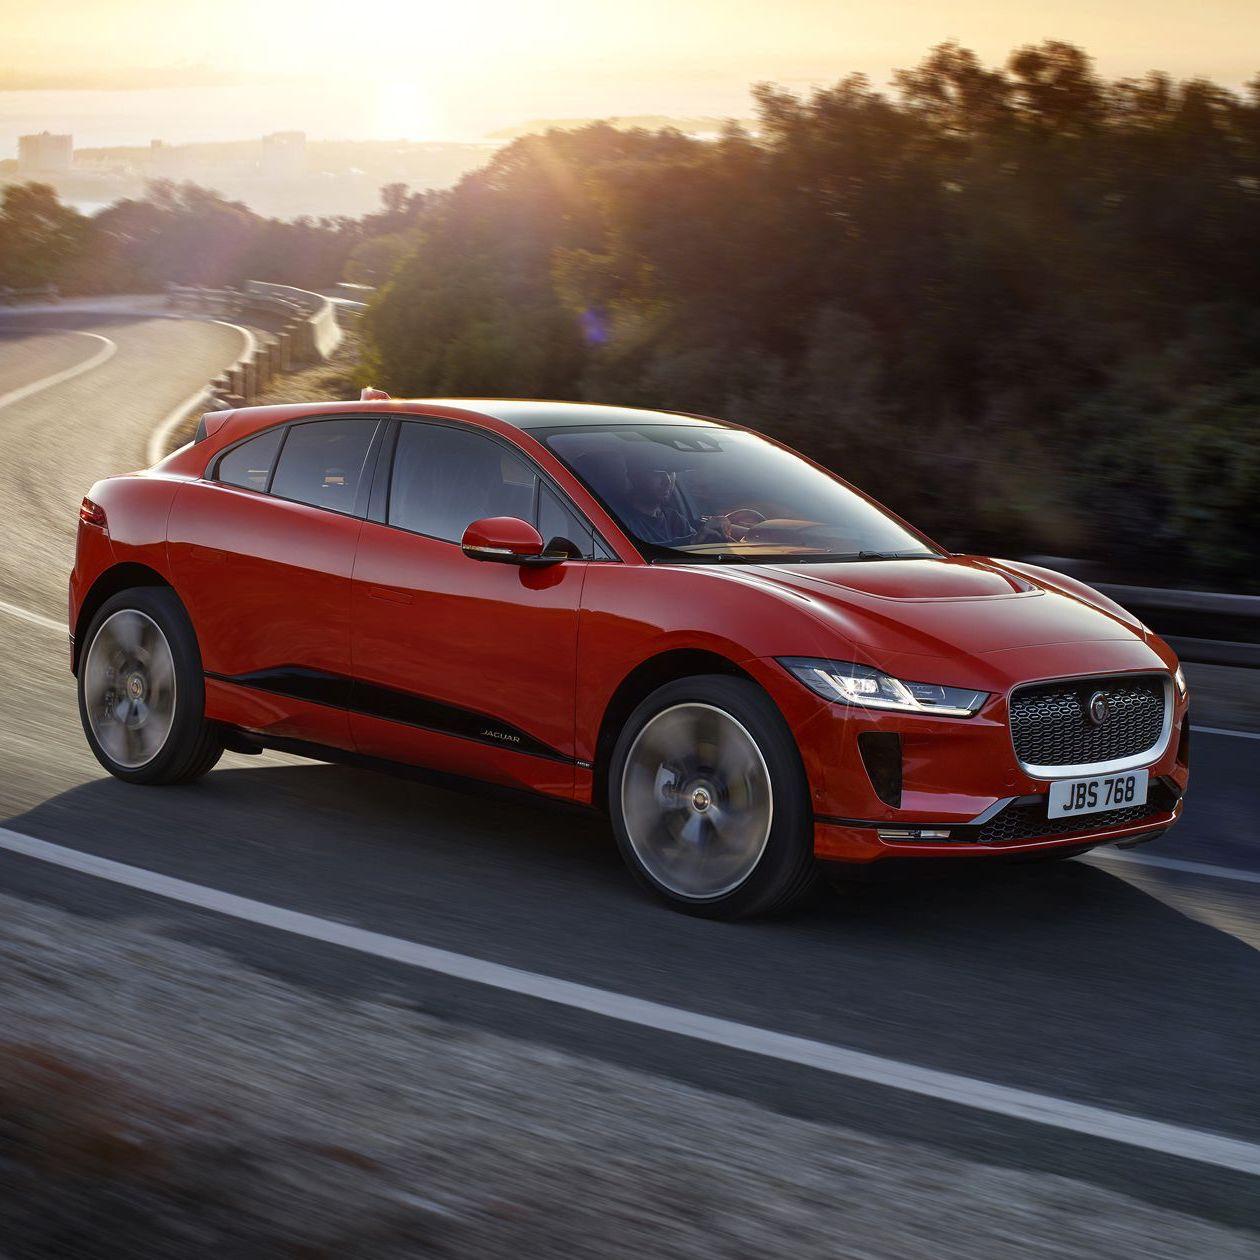 [Gewerbe] Jaguar I-Pace S AWD Automatik (400PS) für mtl. 359€ (netto) / mtl. 427,21€ (brutto) inkl. Wartung & Verschleiß, 36 Monate, LF 0,53